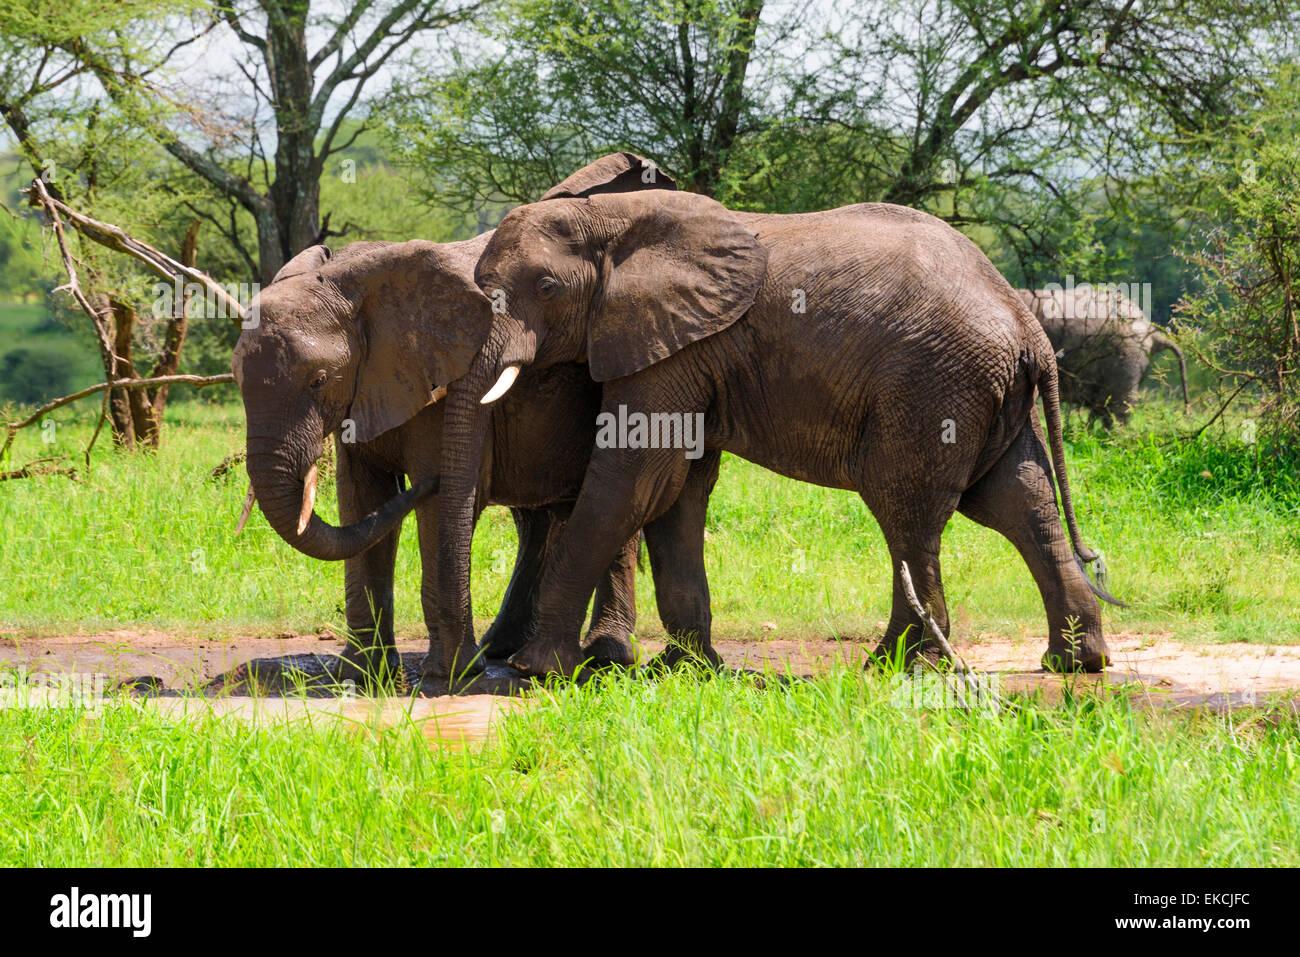 Loxodonta africana Portrait of elephants in Tarangire National Park, Manyara Region, Tanzania, Africa. - Stock Image